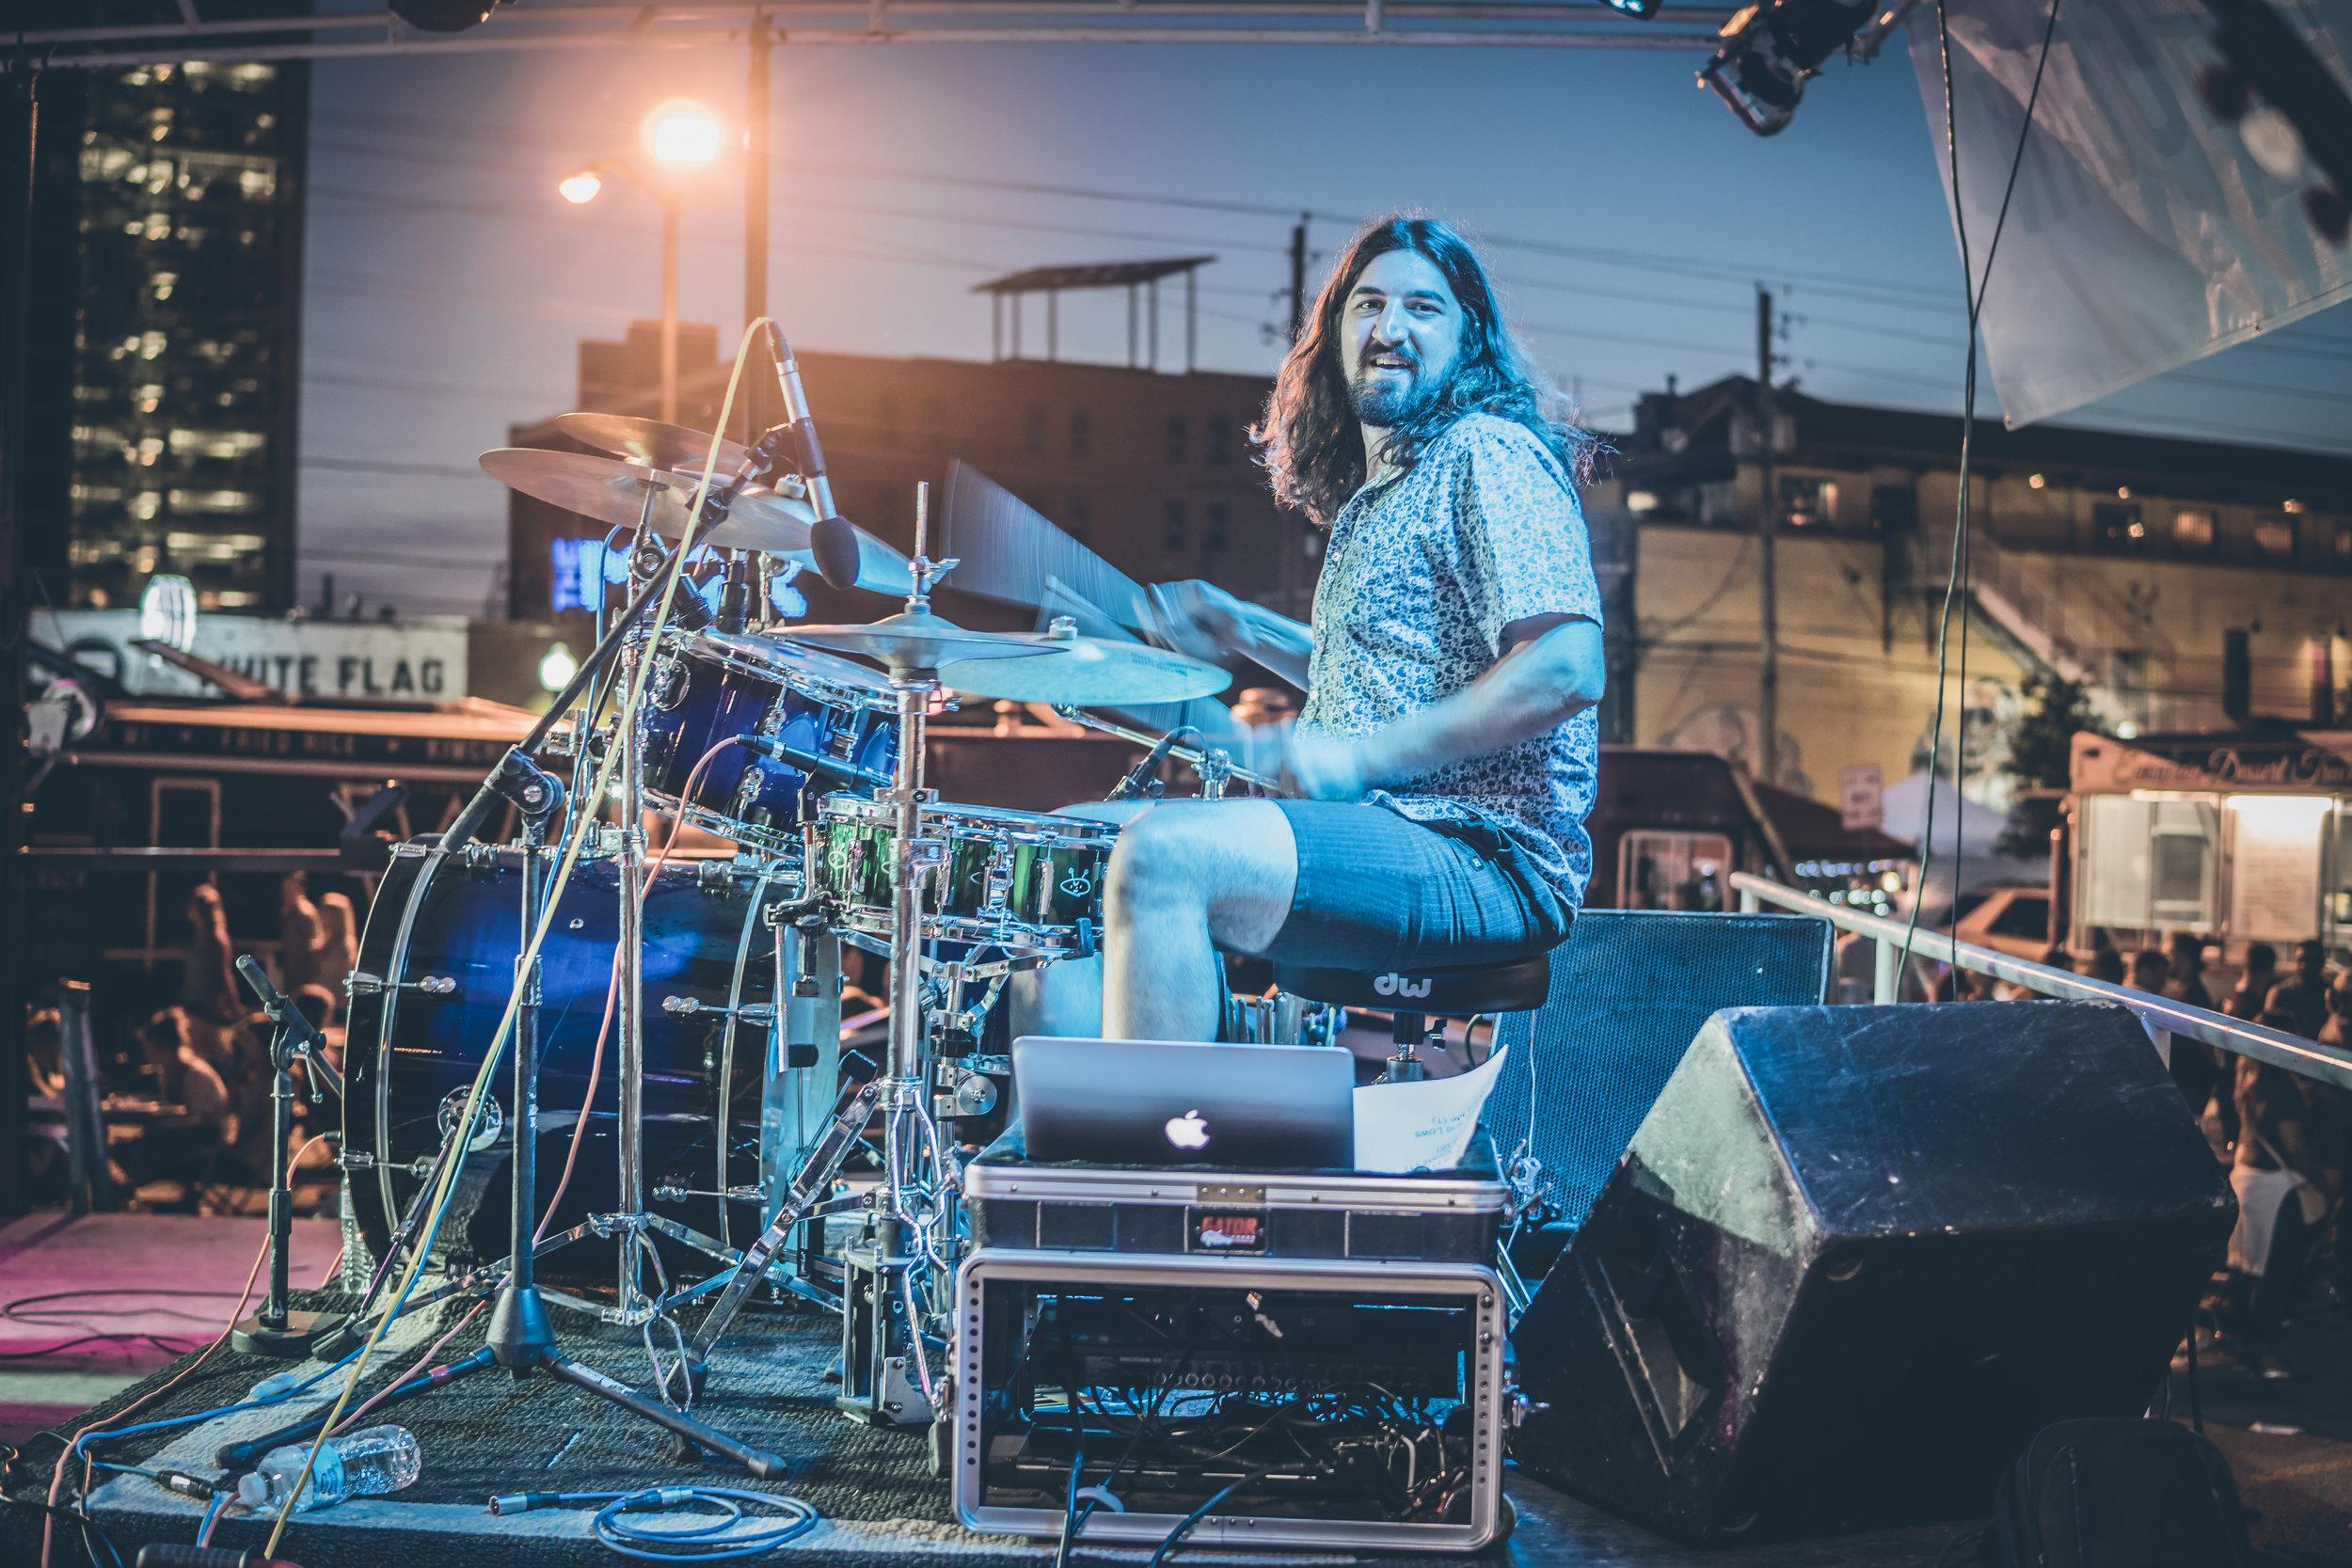 FM Pilots - Blue Dome Arts Festival - Tulsa, OK 052116-1.jpg